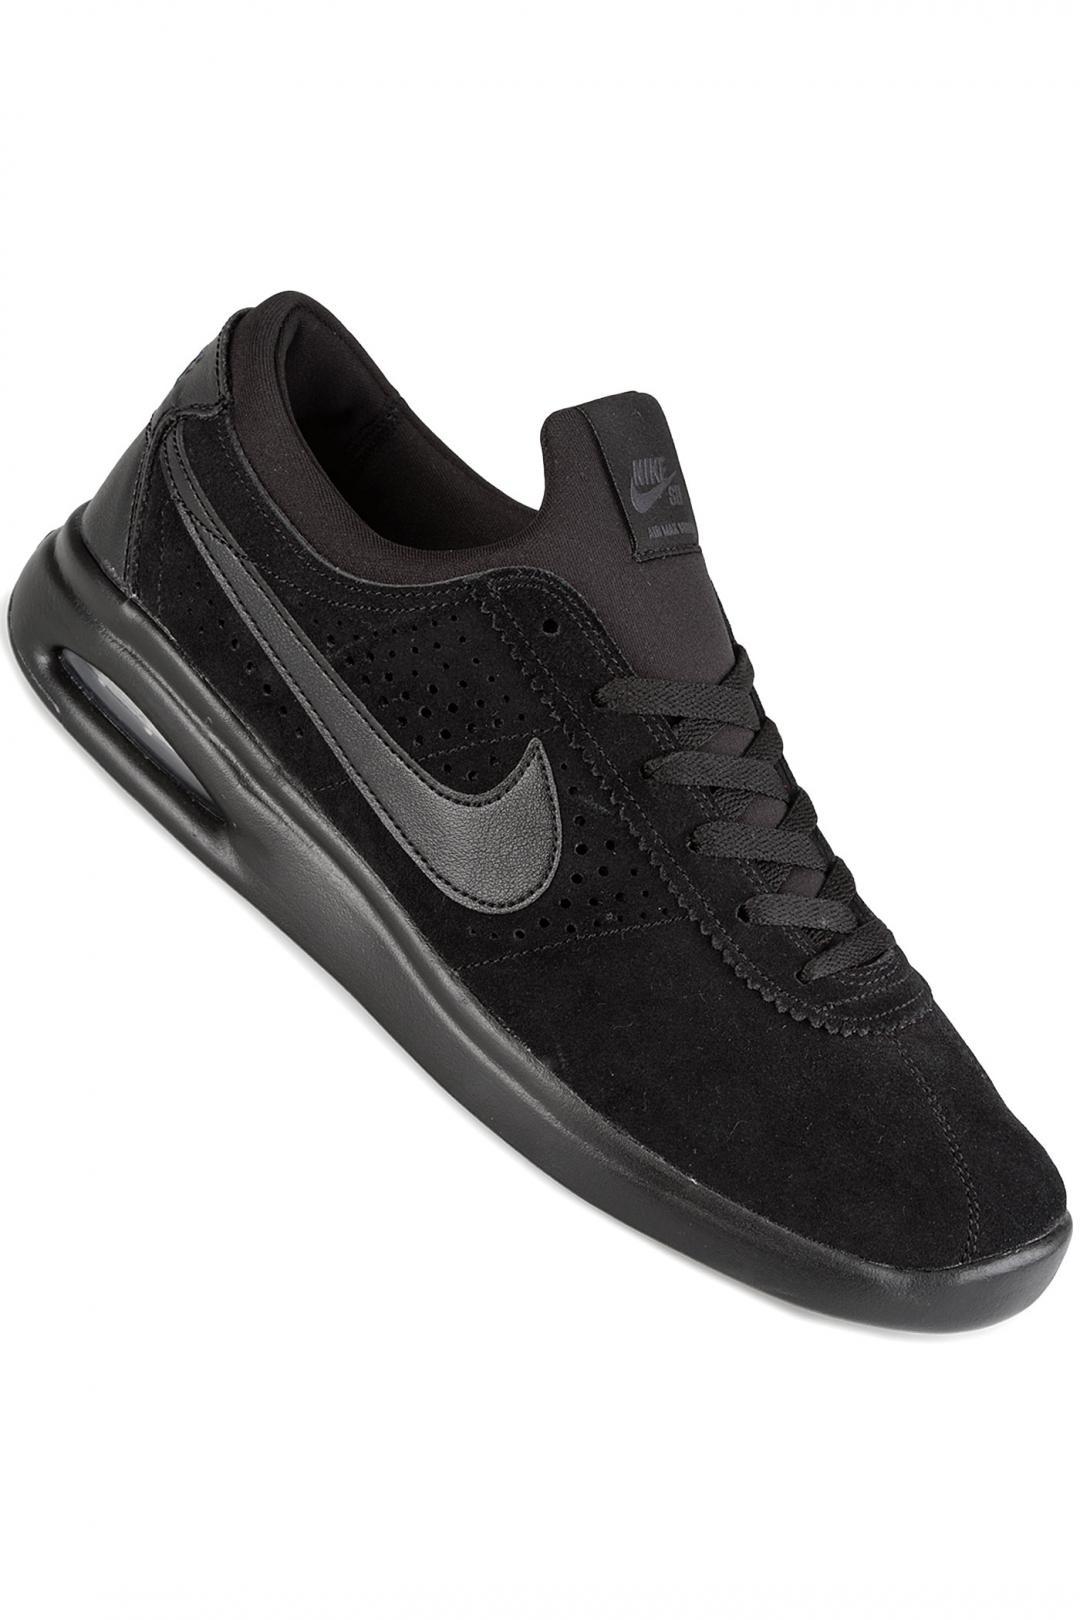 Uomo Nike SB Air Max Bruin Vapor black black anthracite   Sneakers low top